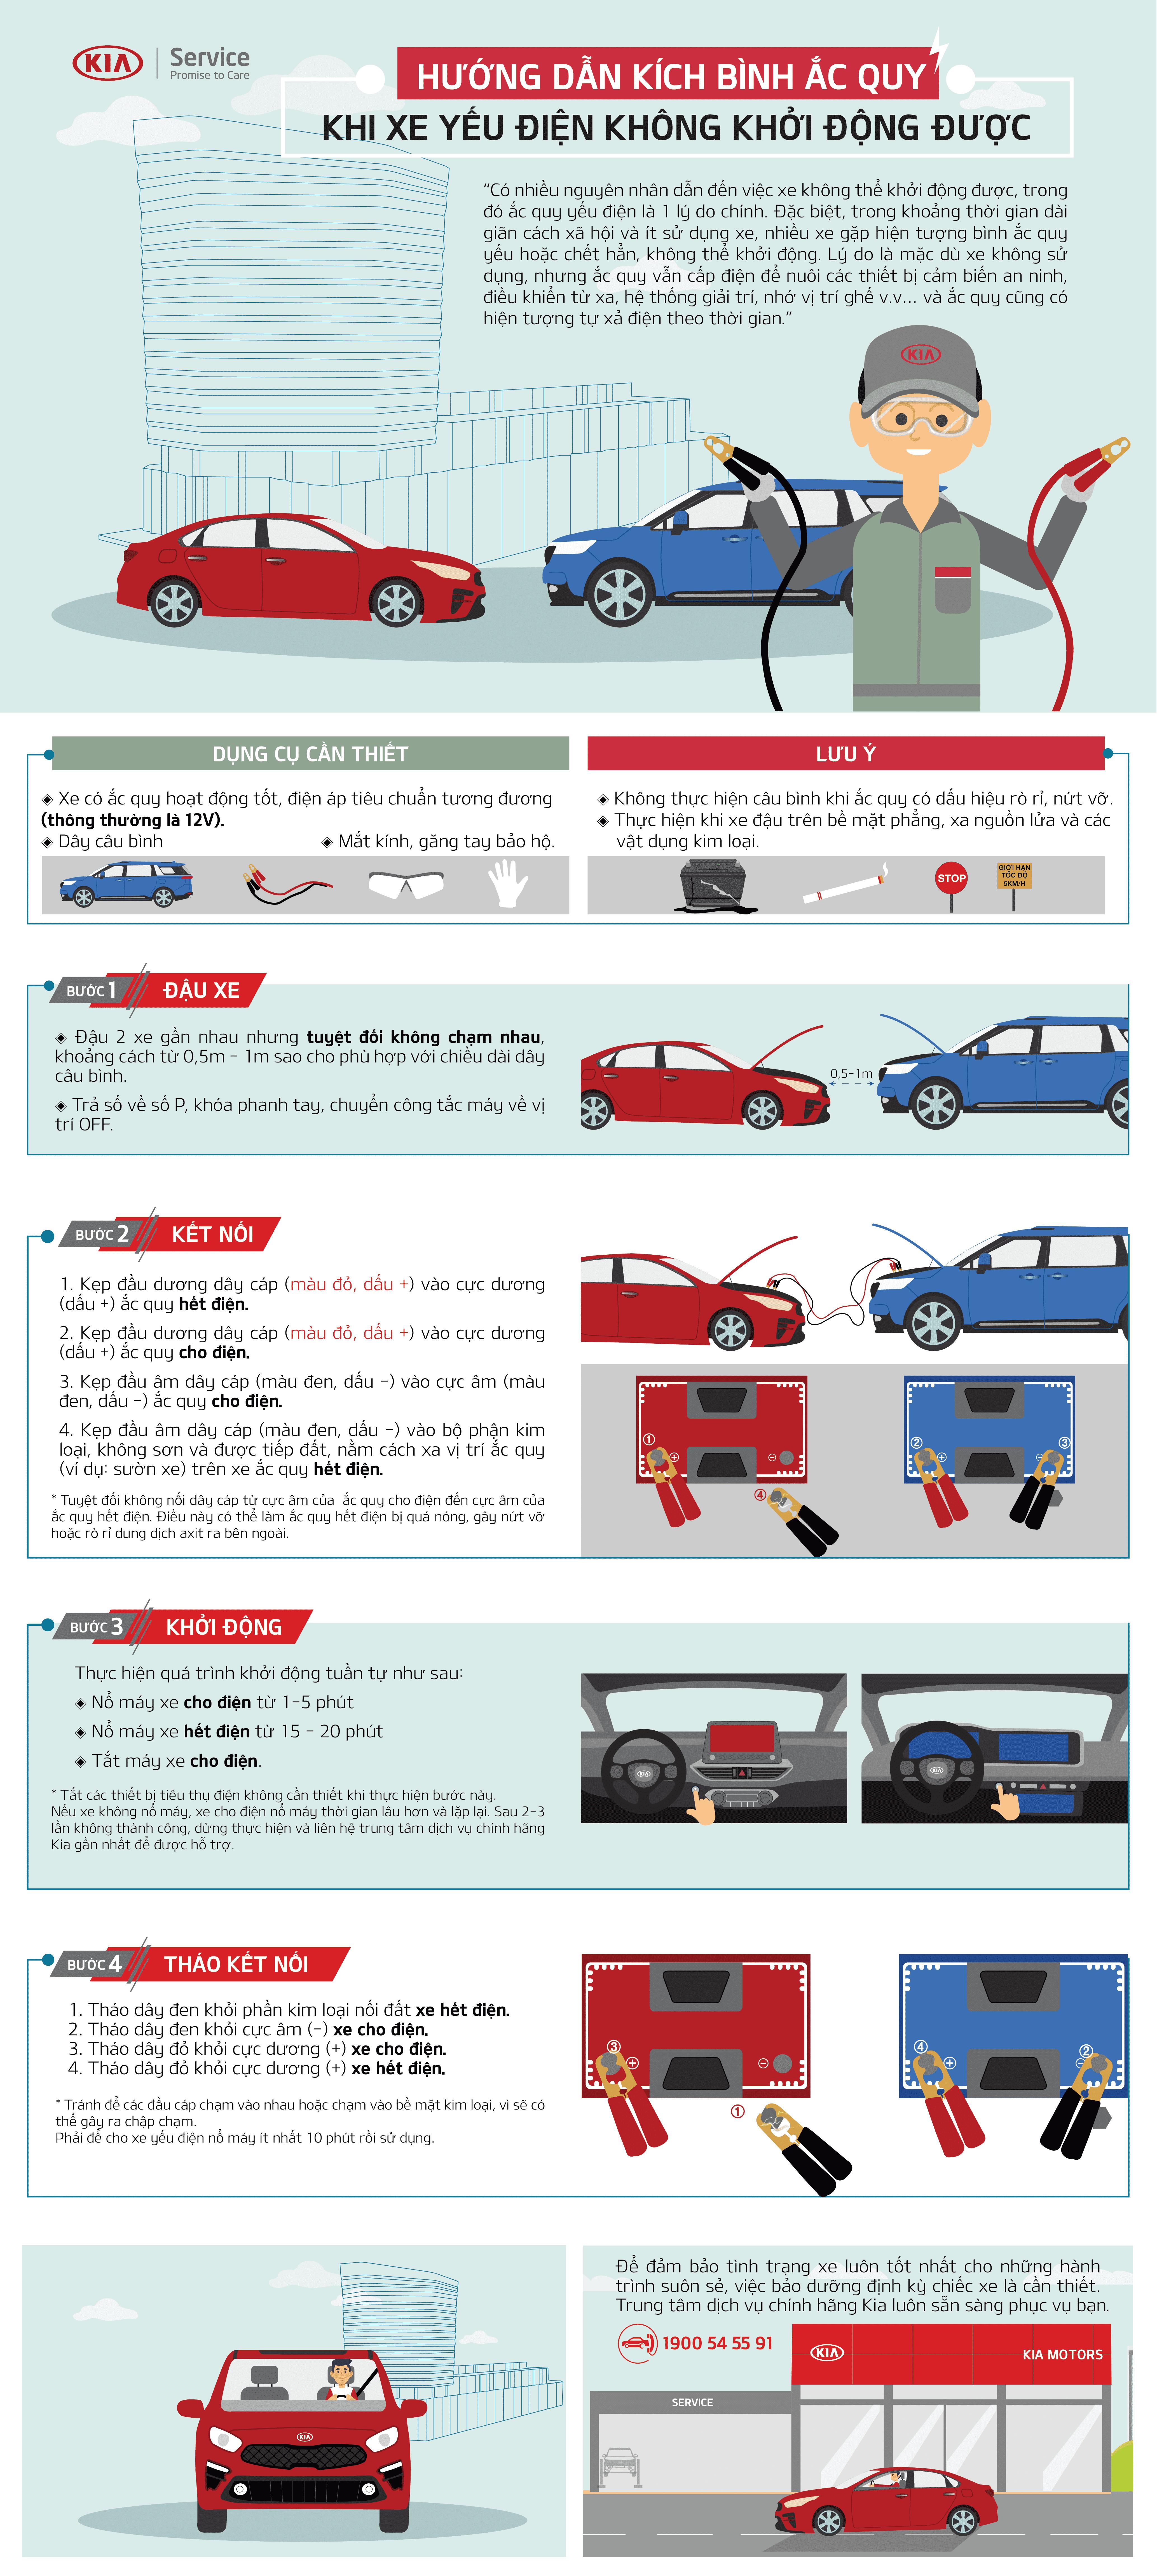 Kia_Infographic_Kich binh ac quy_310821